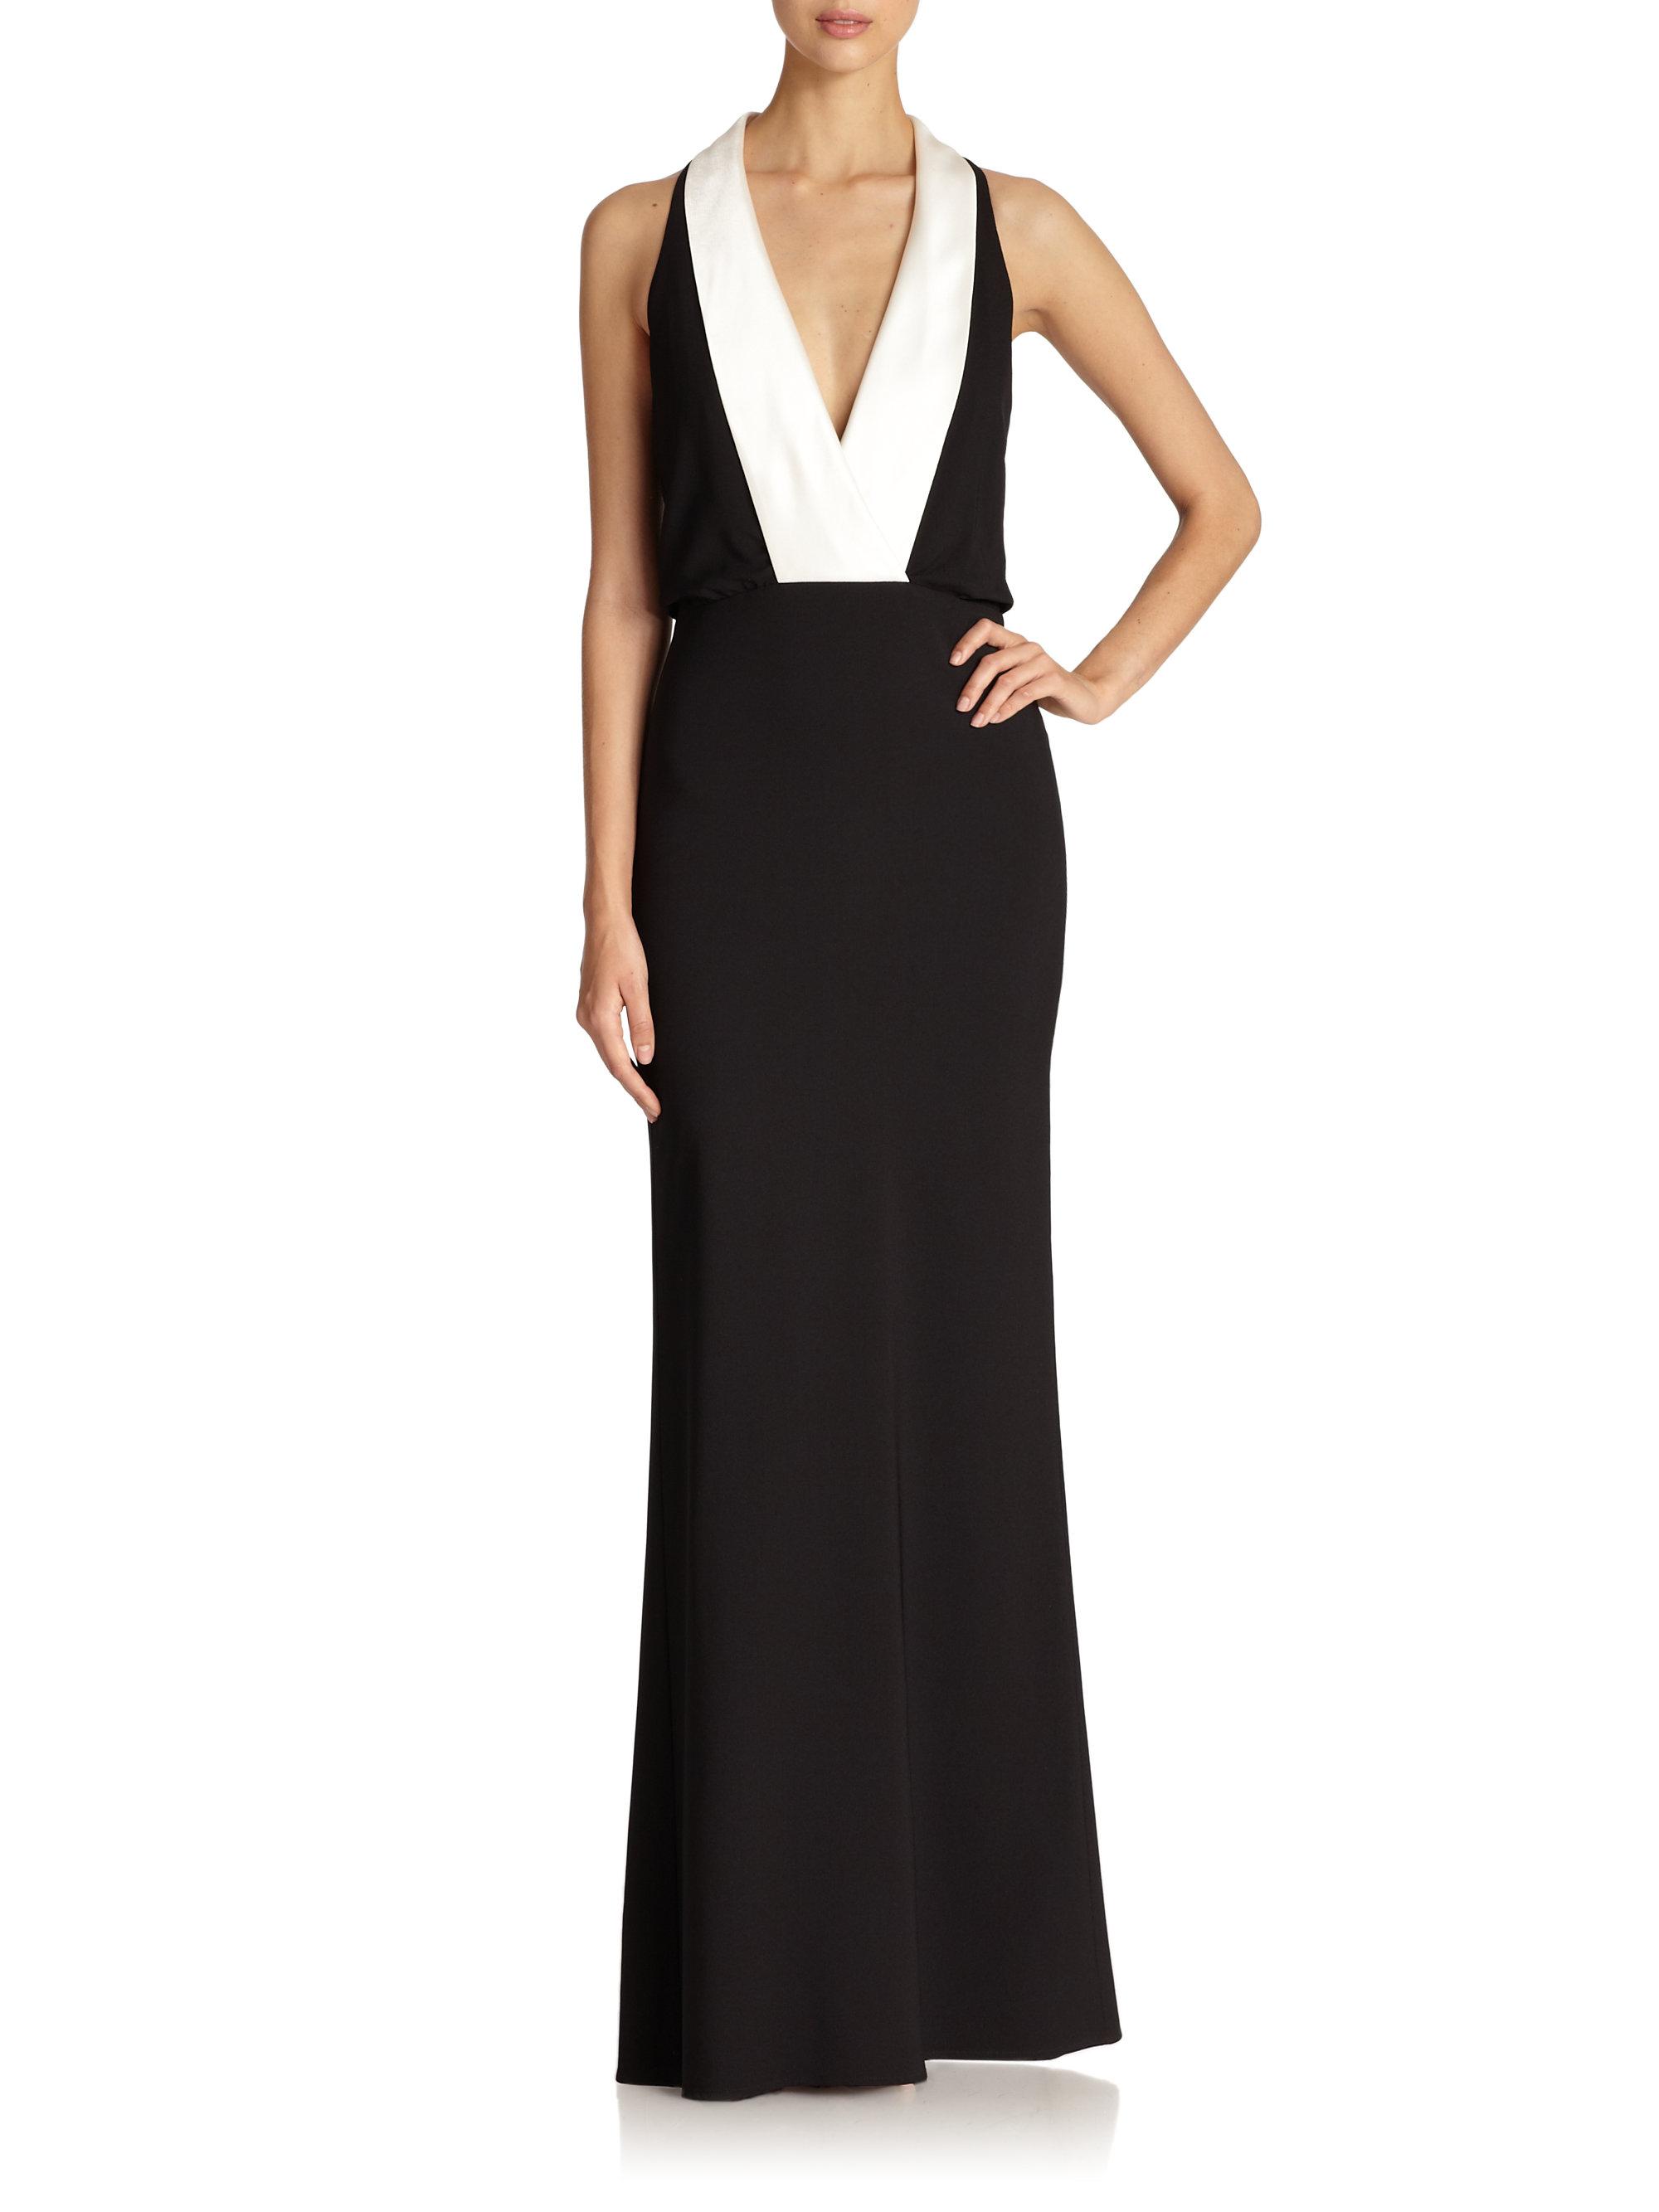 Lyst - Abs by allen schwartz Crepe Tuxedo Gown in Black